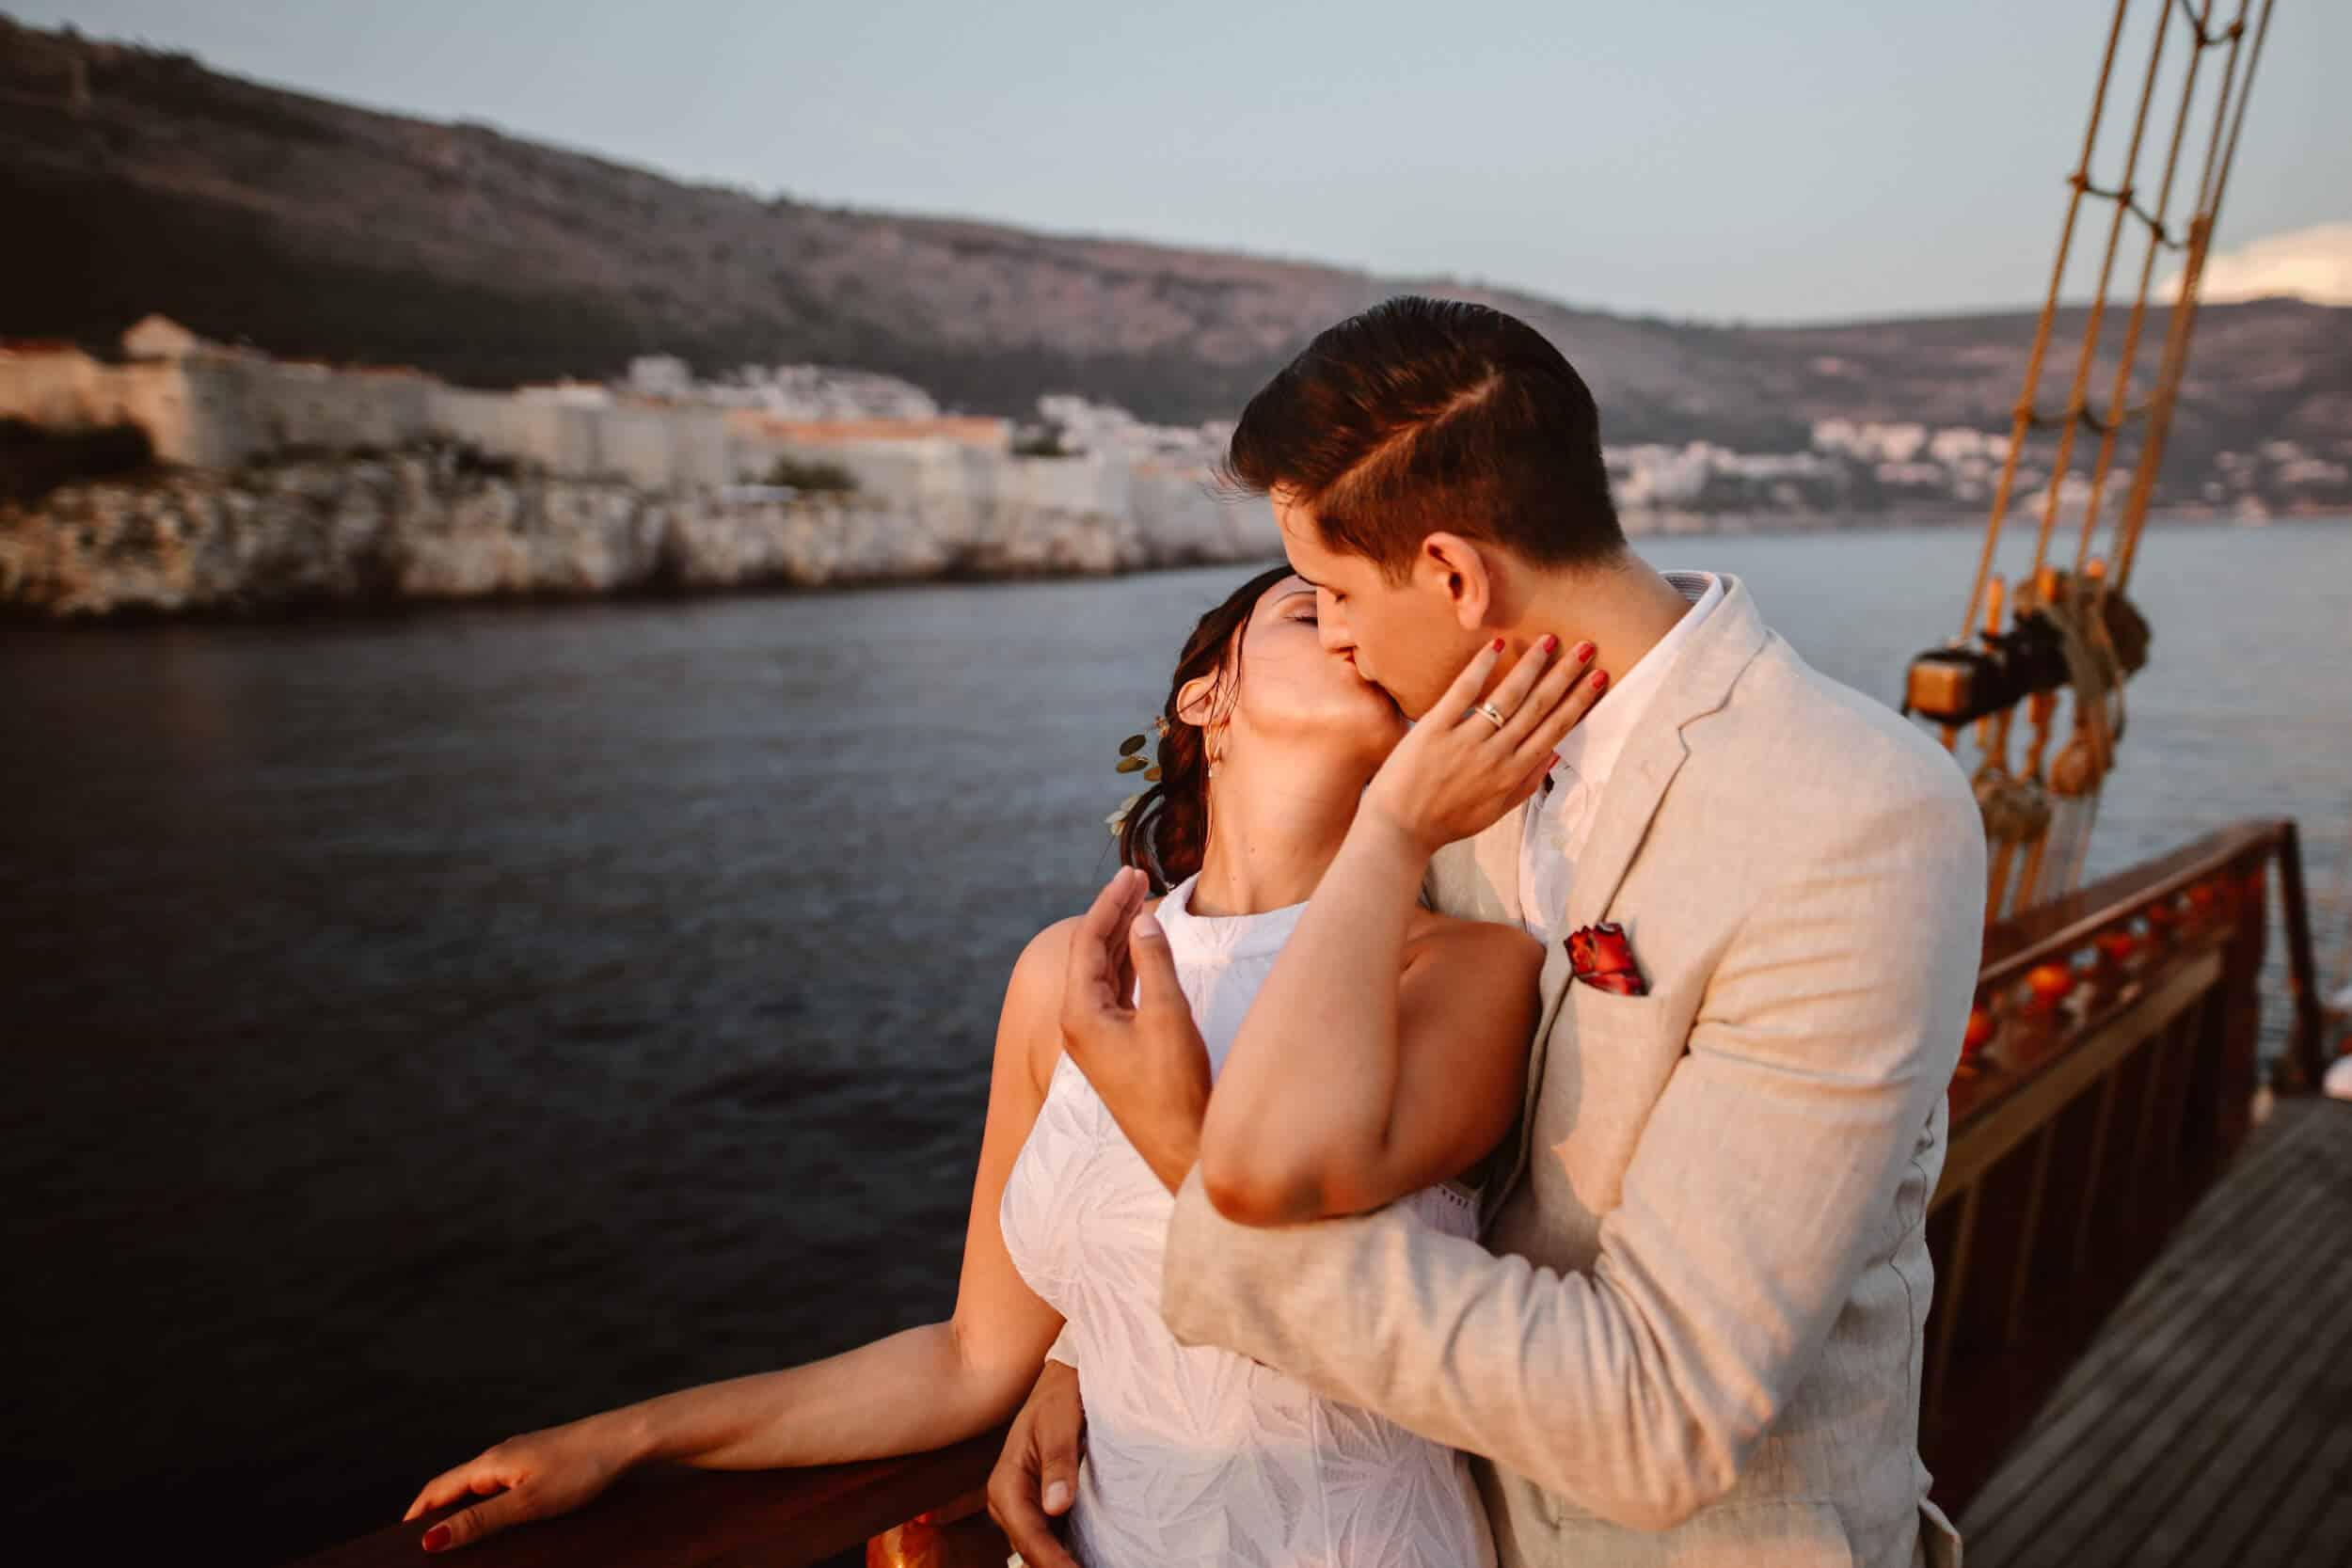 Dubrovnik karaka boat elopement matea stephan 14 | Croatia Elopement Photographer and Videographer